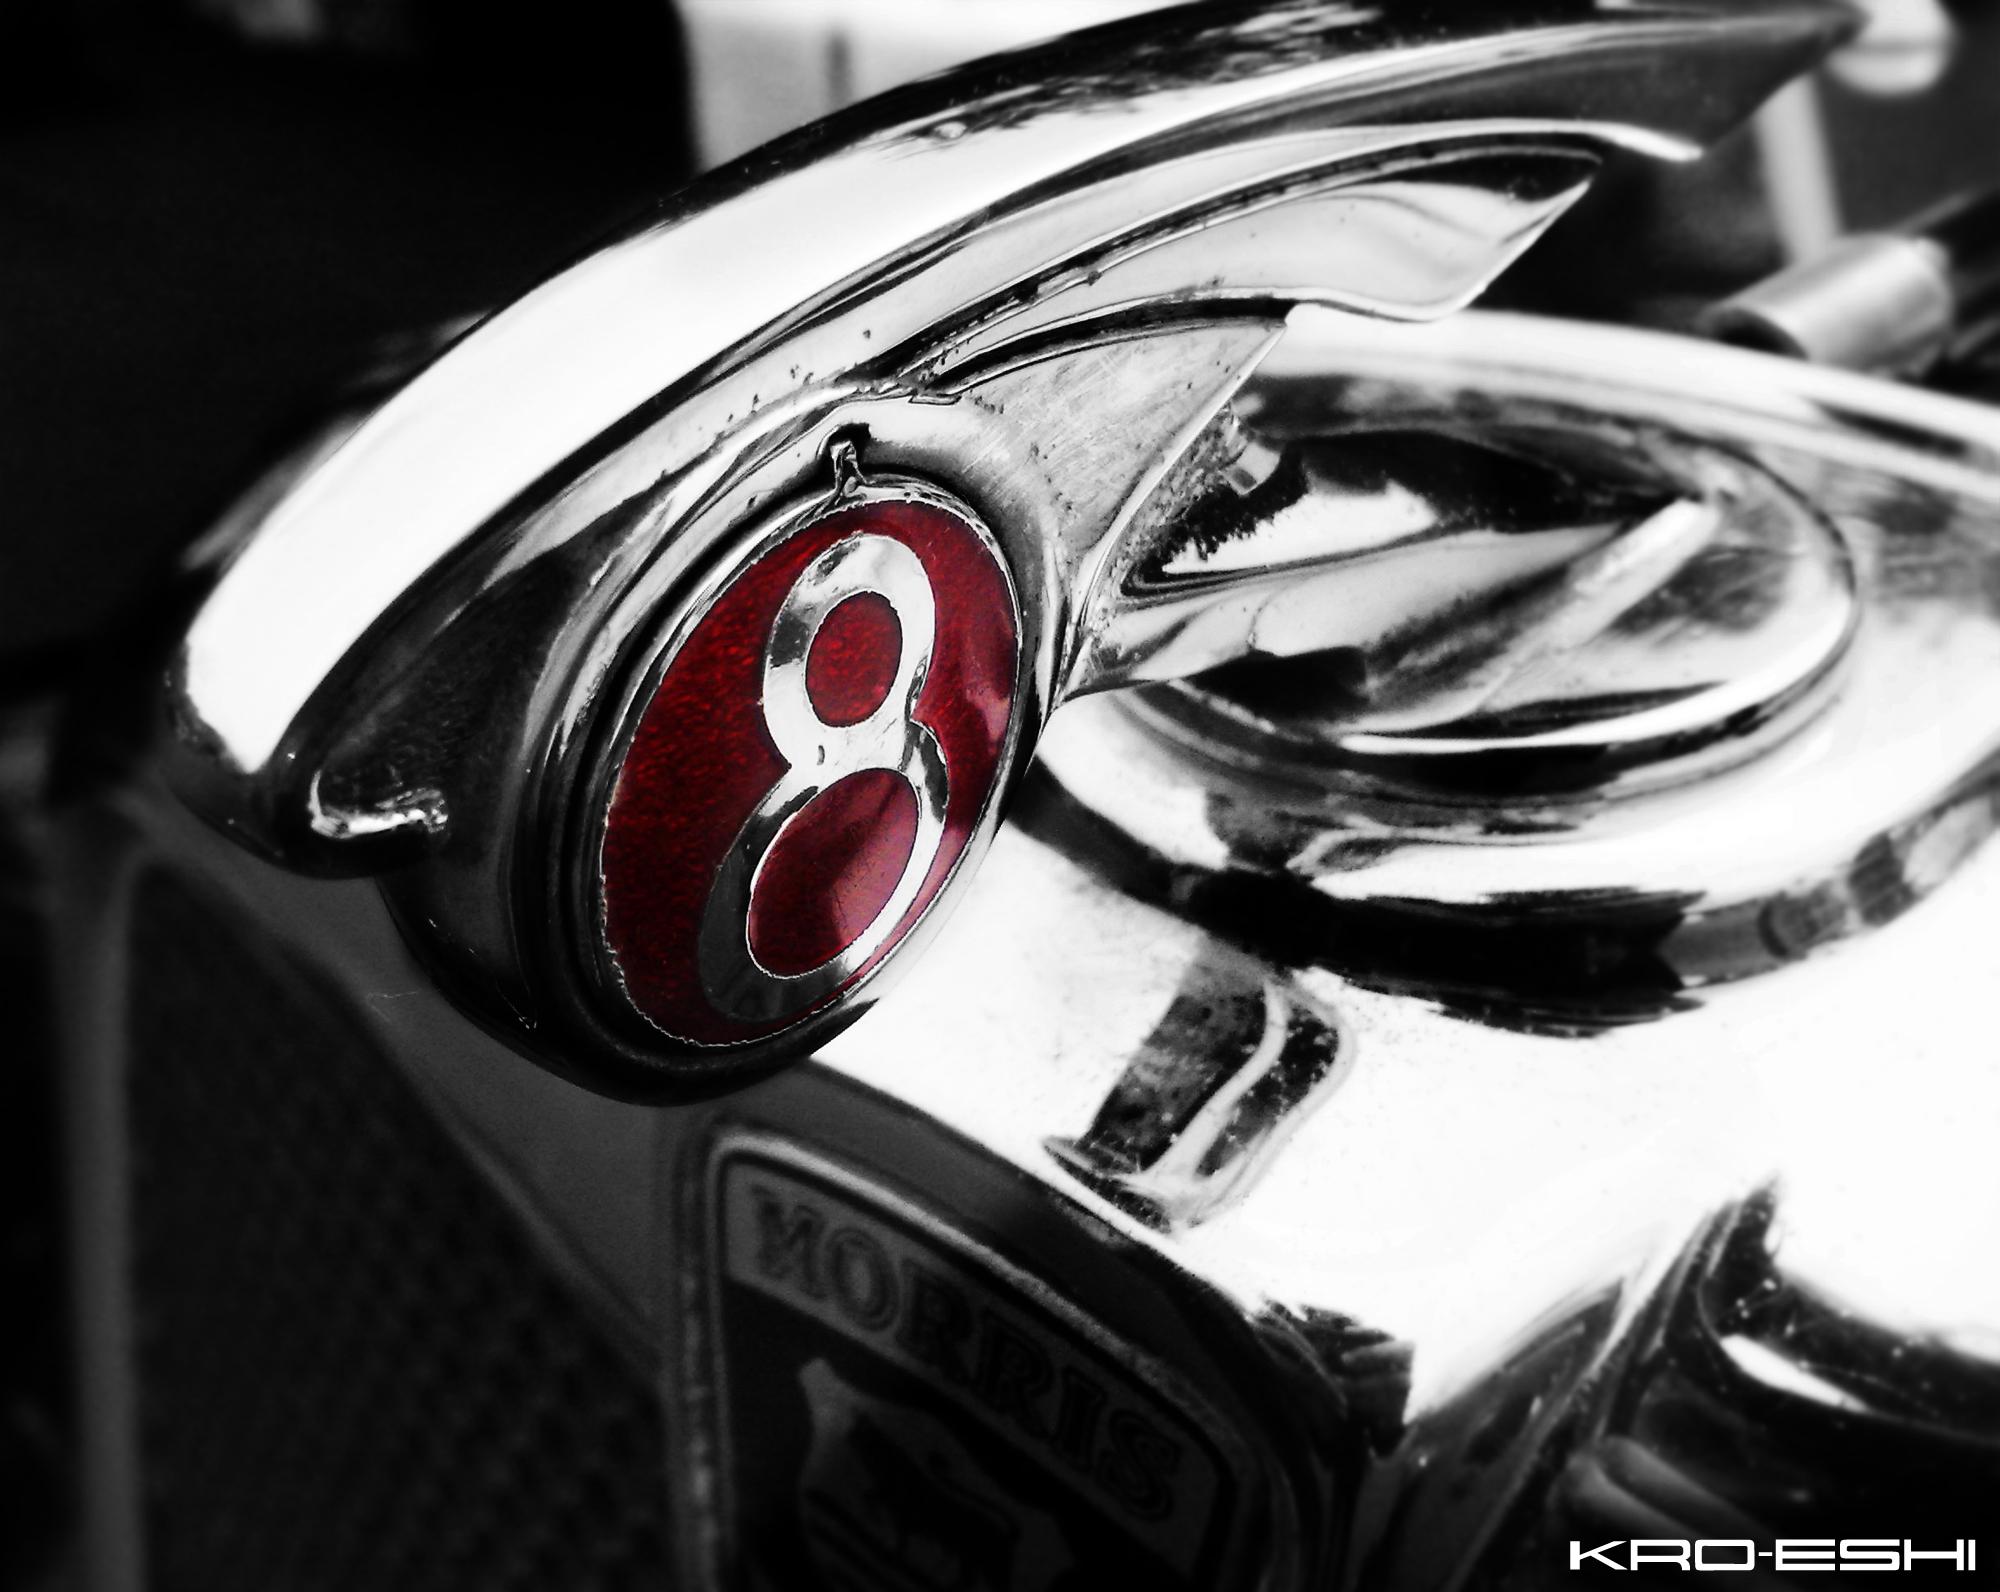 Morris Minor Emblem by